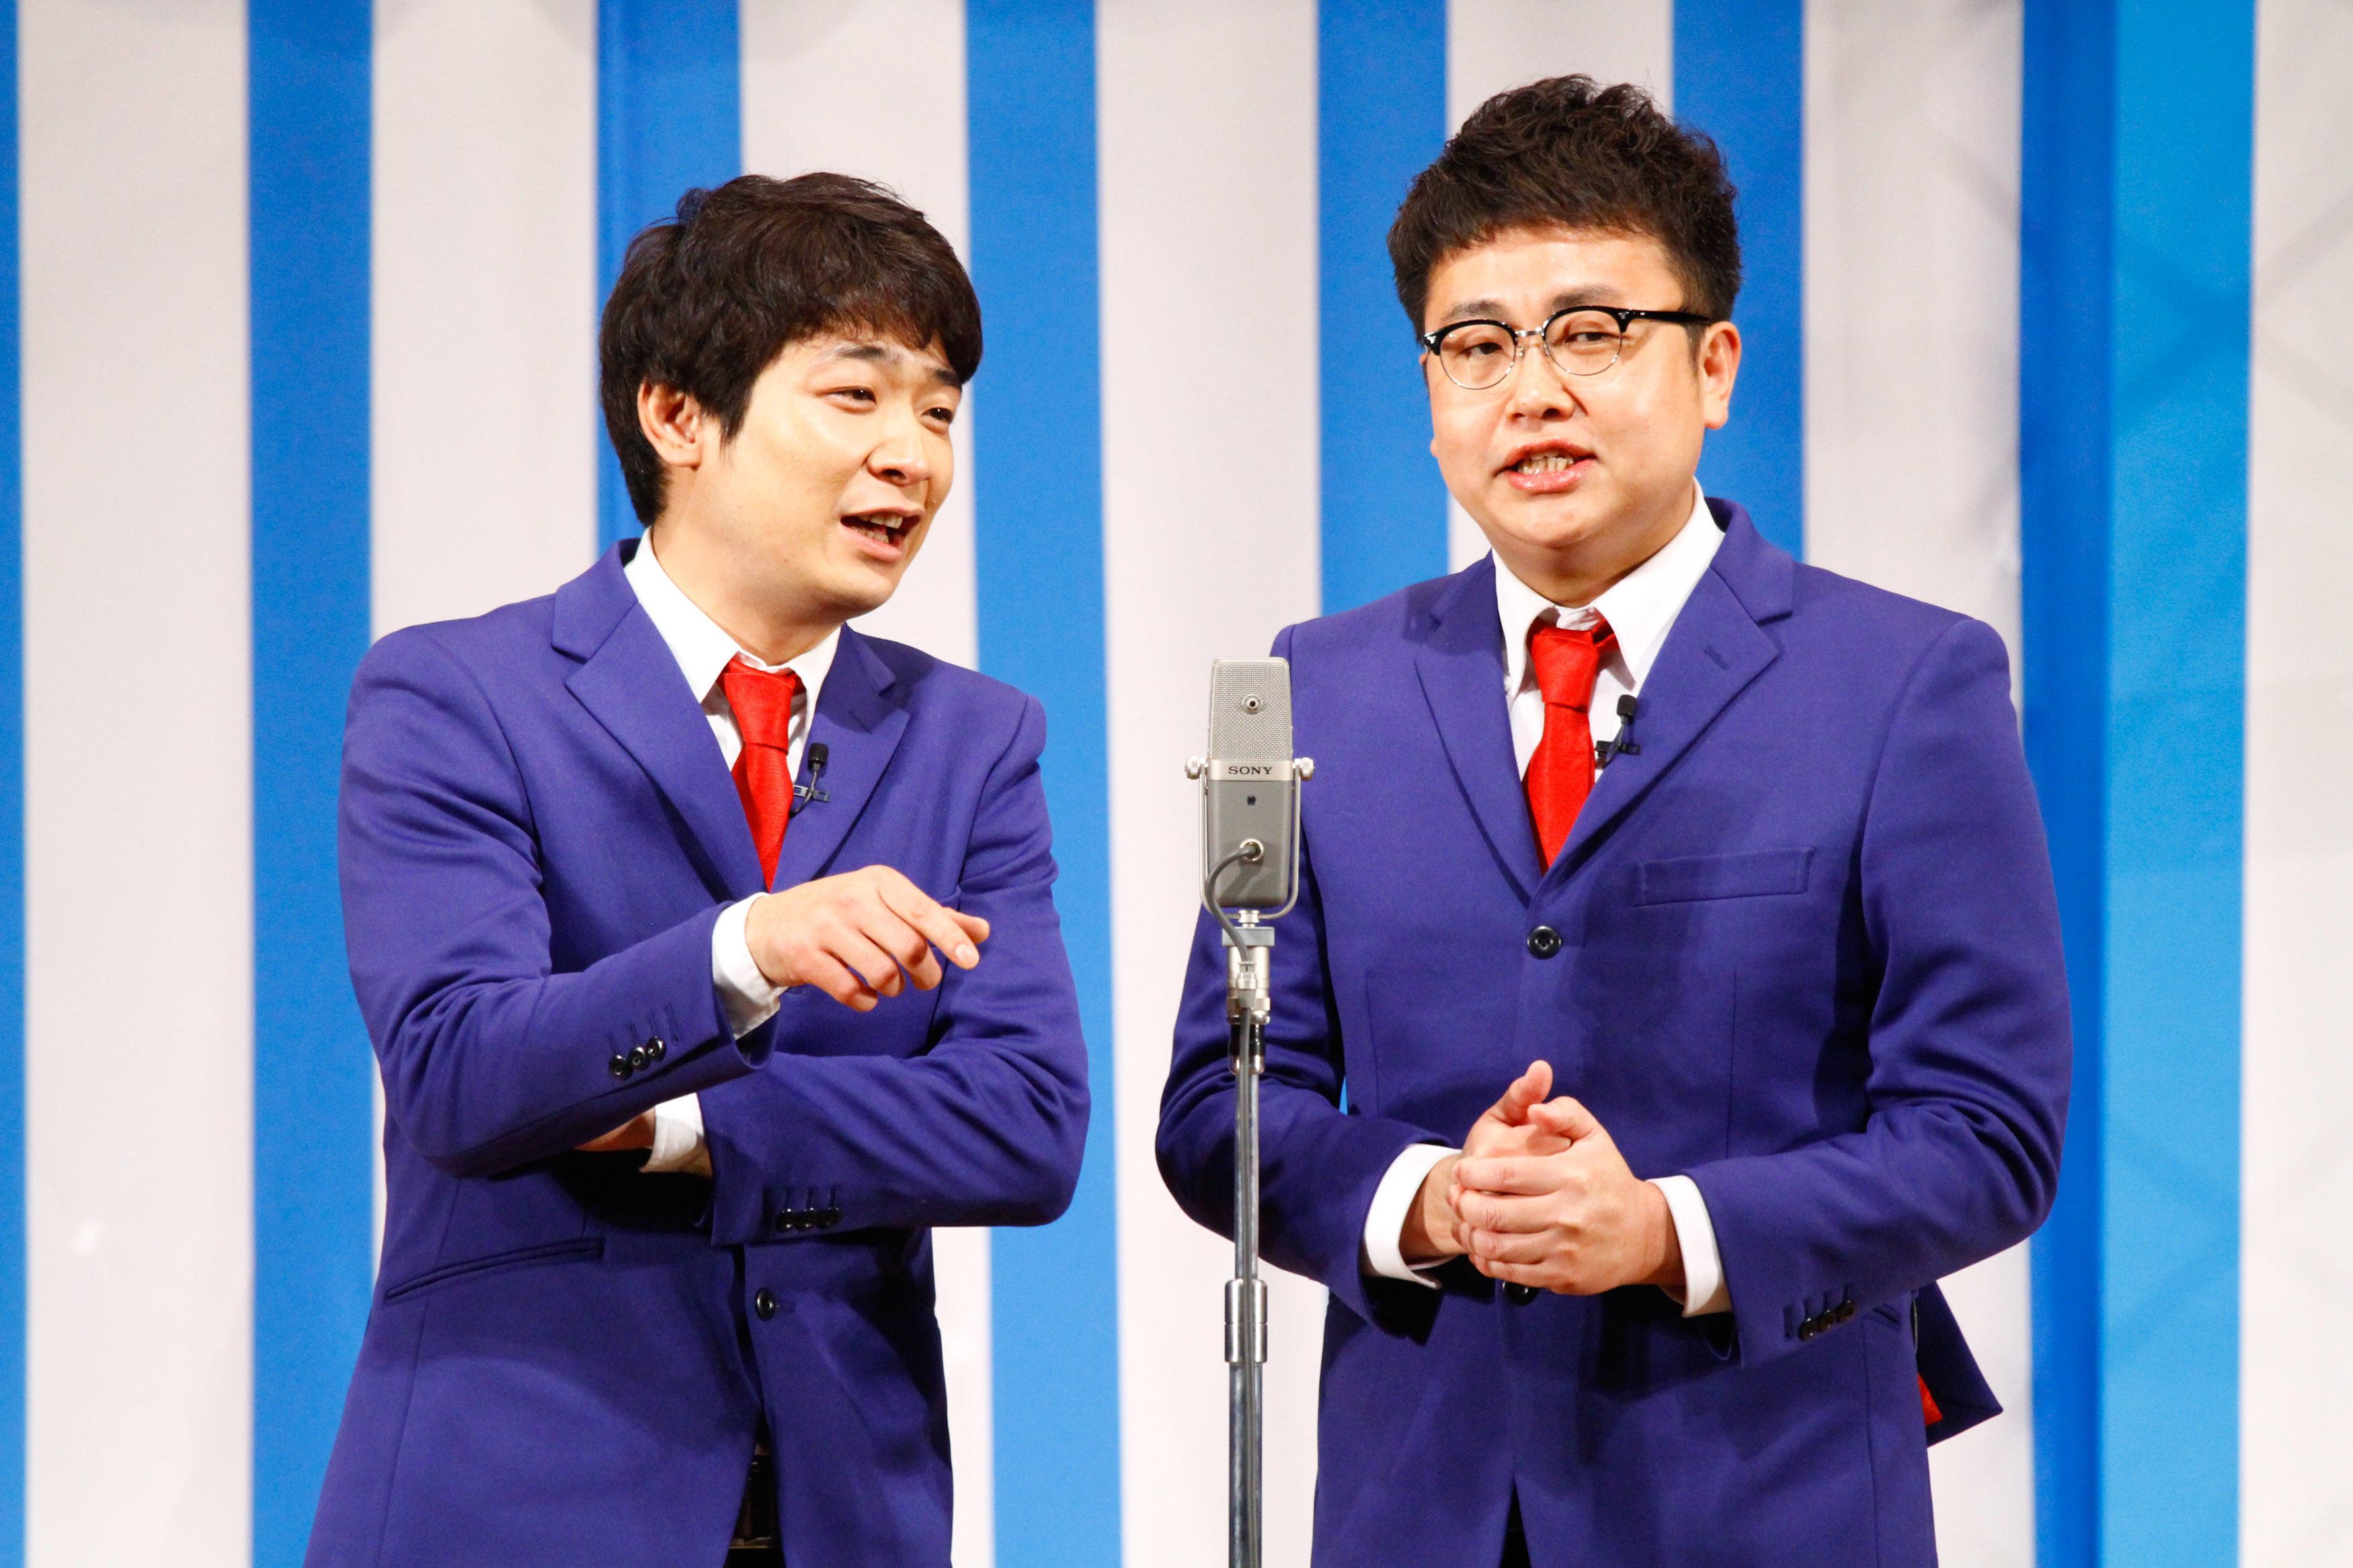 http://news.yoshimoto.co.jp/20190108100214-4d5184da9de5583bf91075998e0f482d54e155c5.jpg